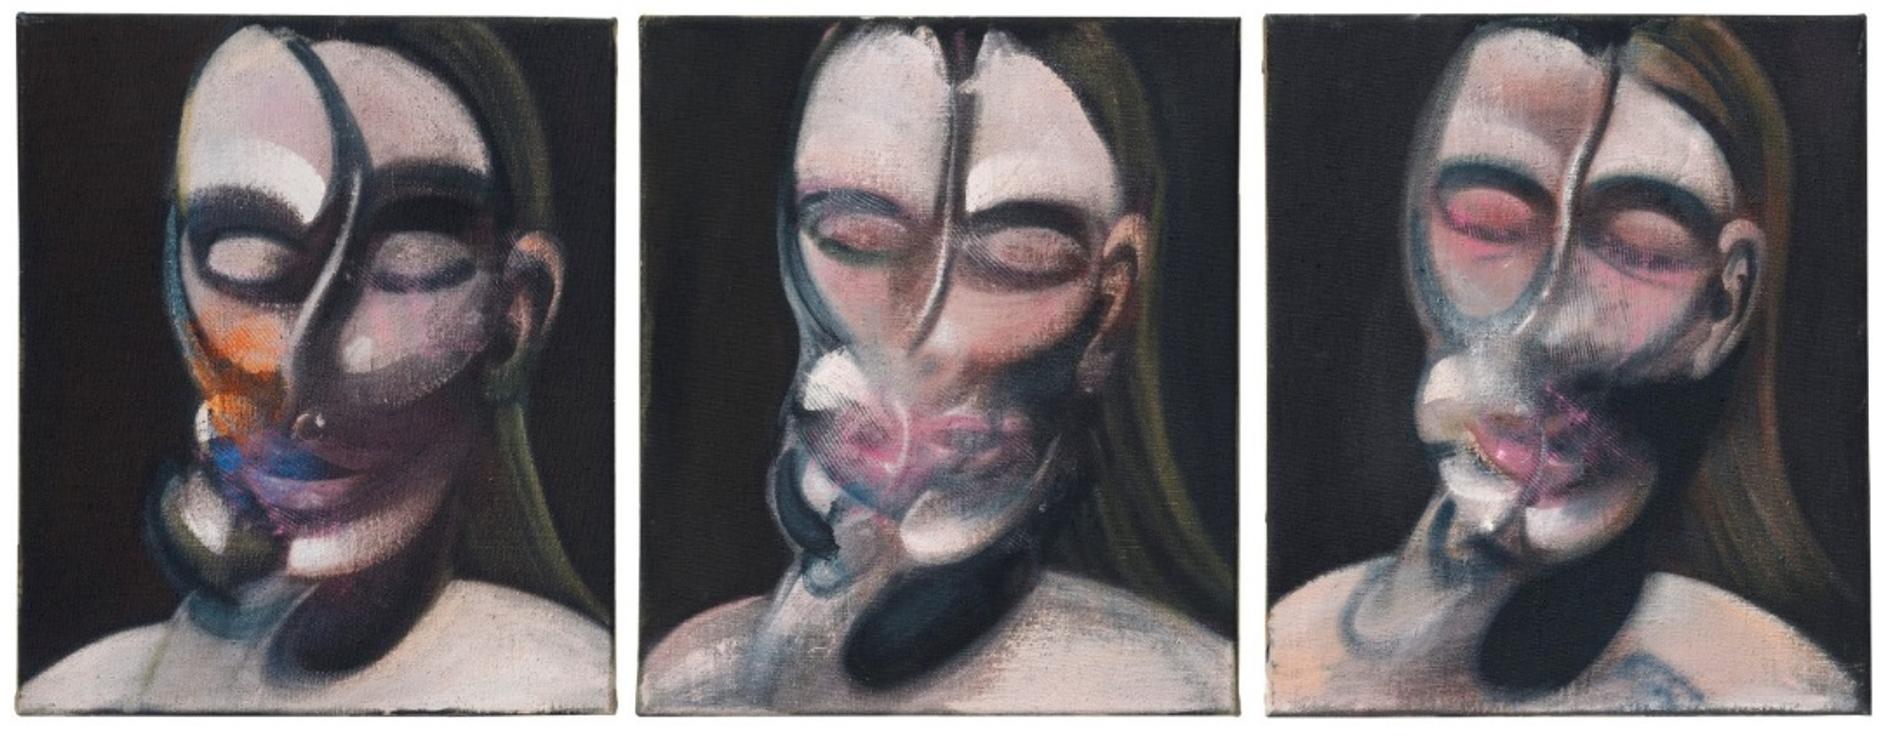 Francis Bacon, Three Studies for a Portrait, Oil on canvas, 1976, Estimate: £10,000,000-15,000,000